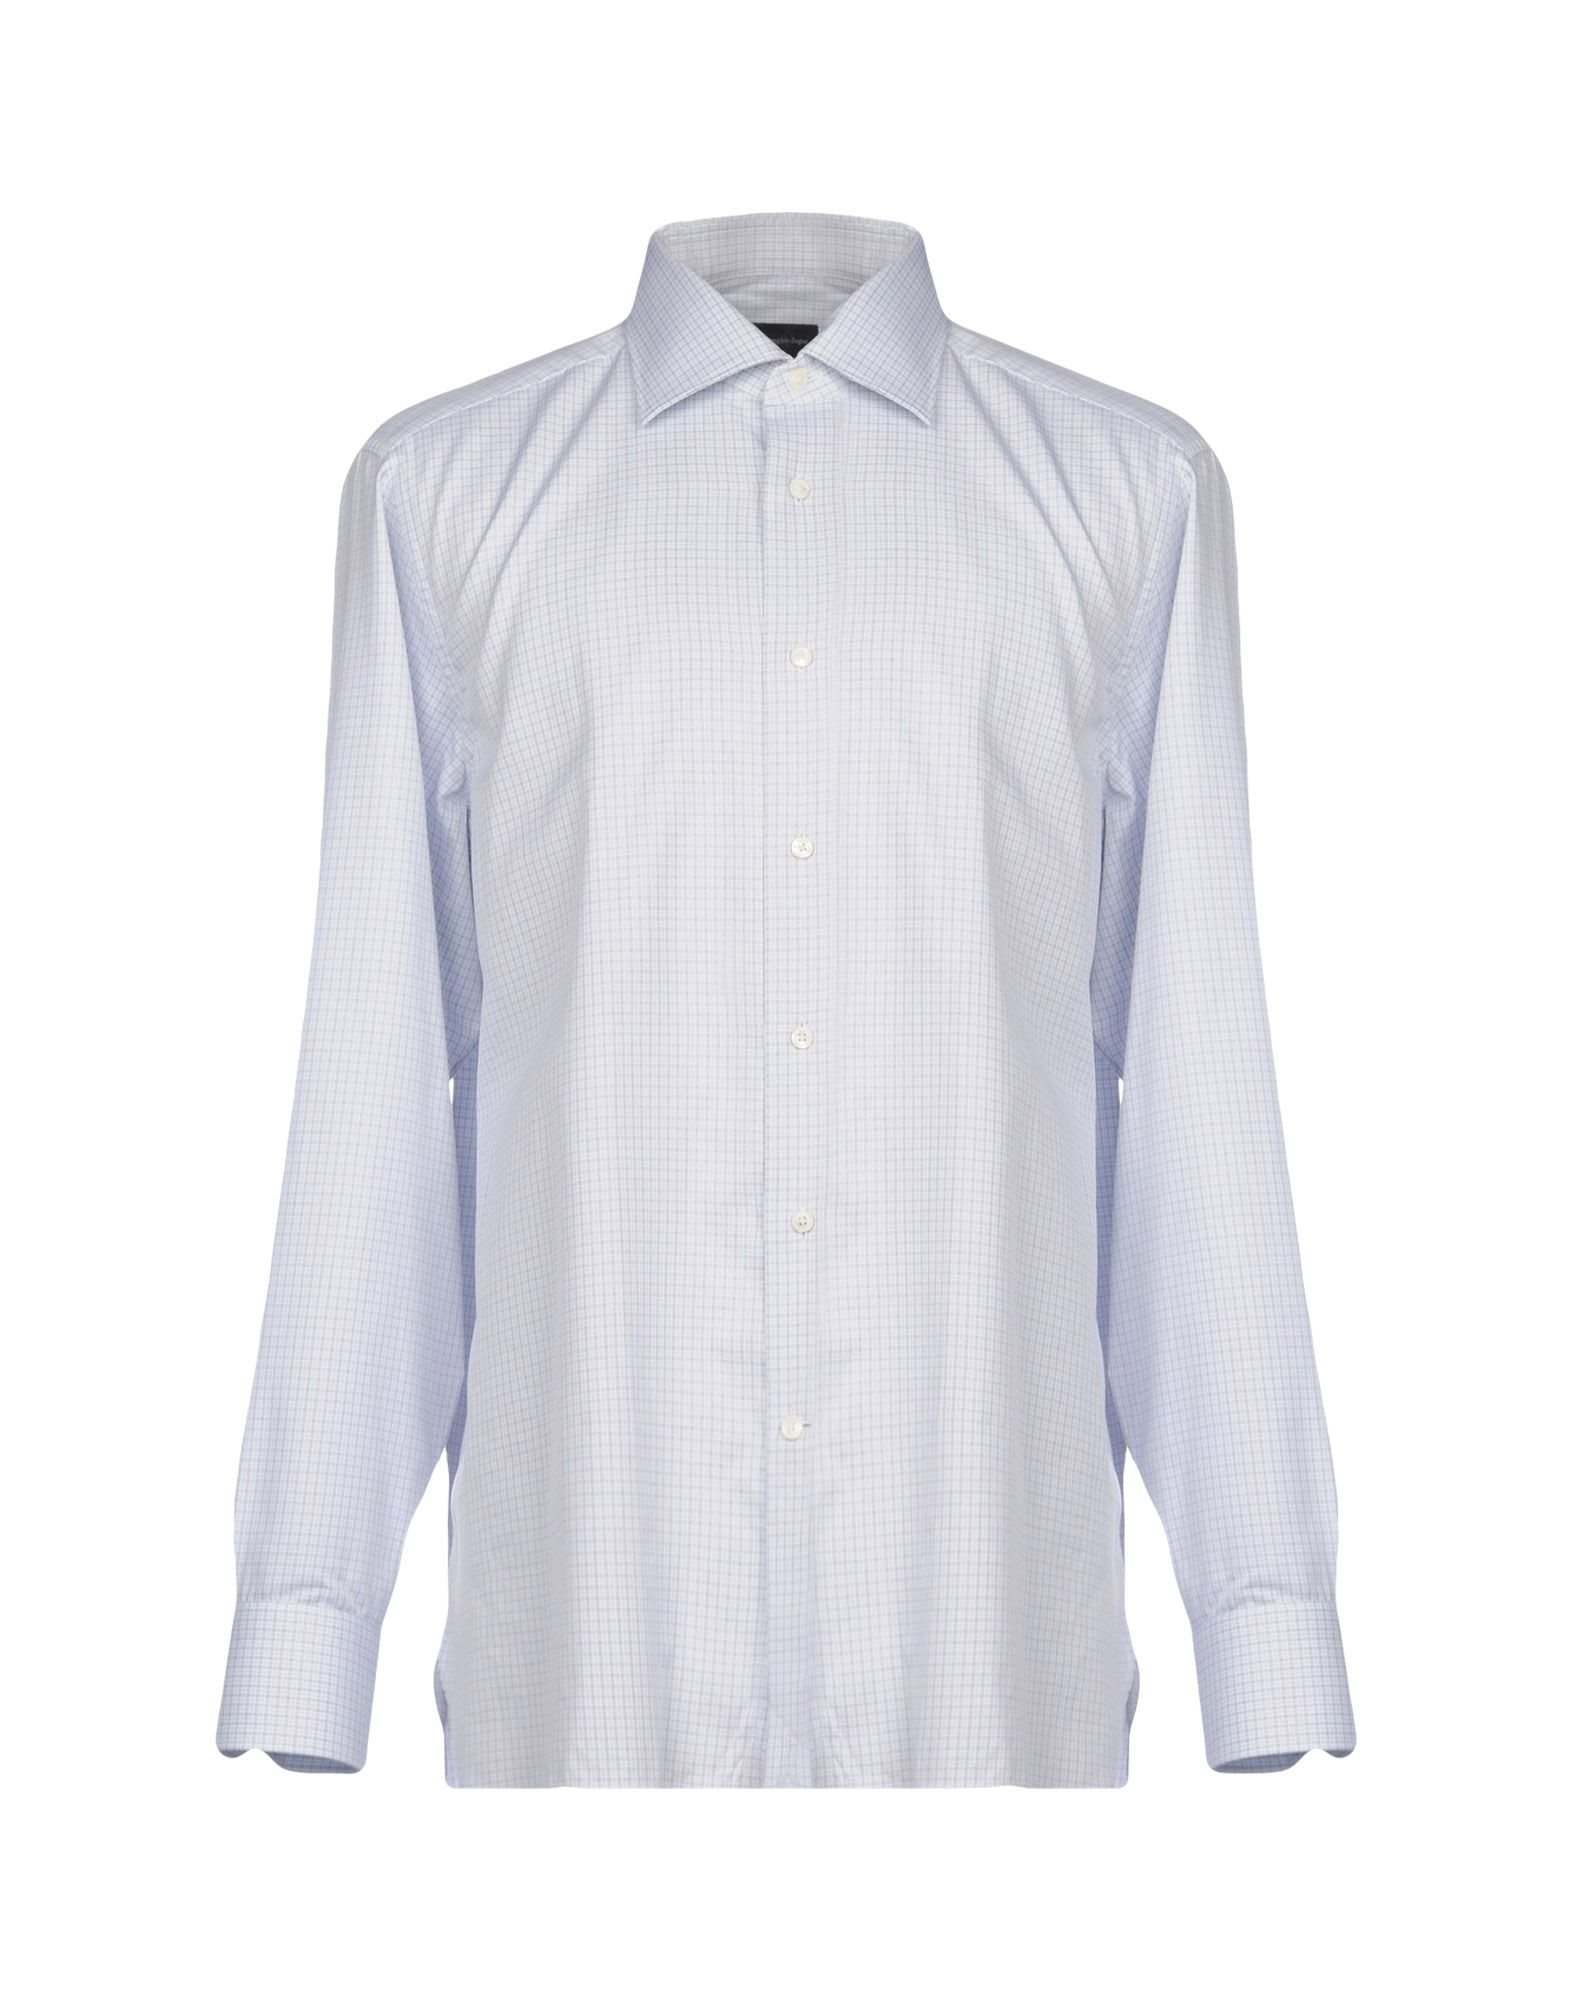 Camicia A Quadri Ermenegildo Zegna Uomo - Acquista online su